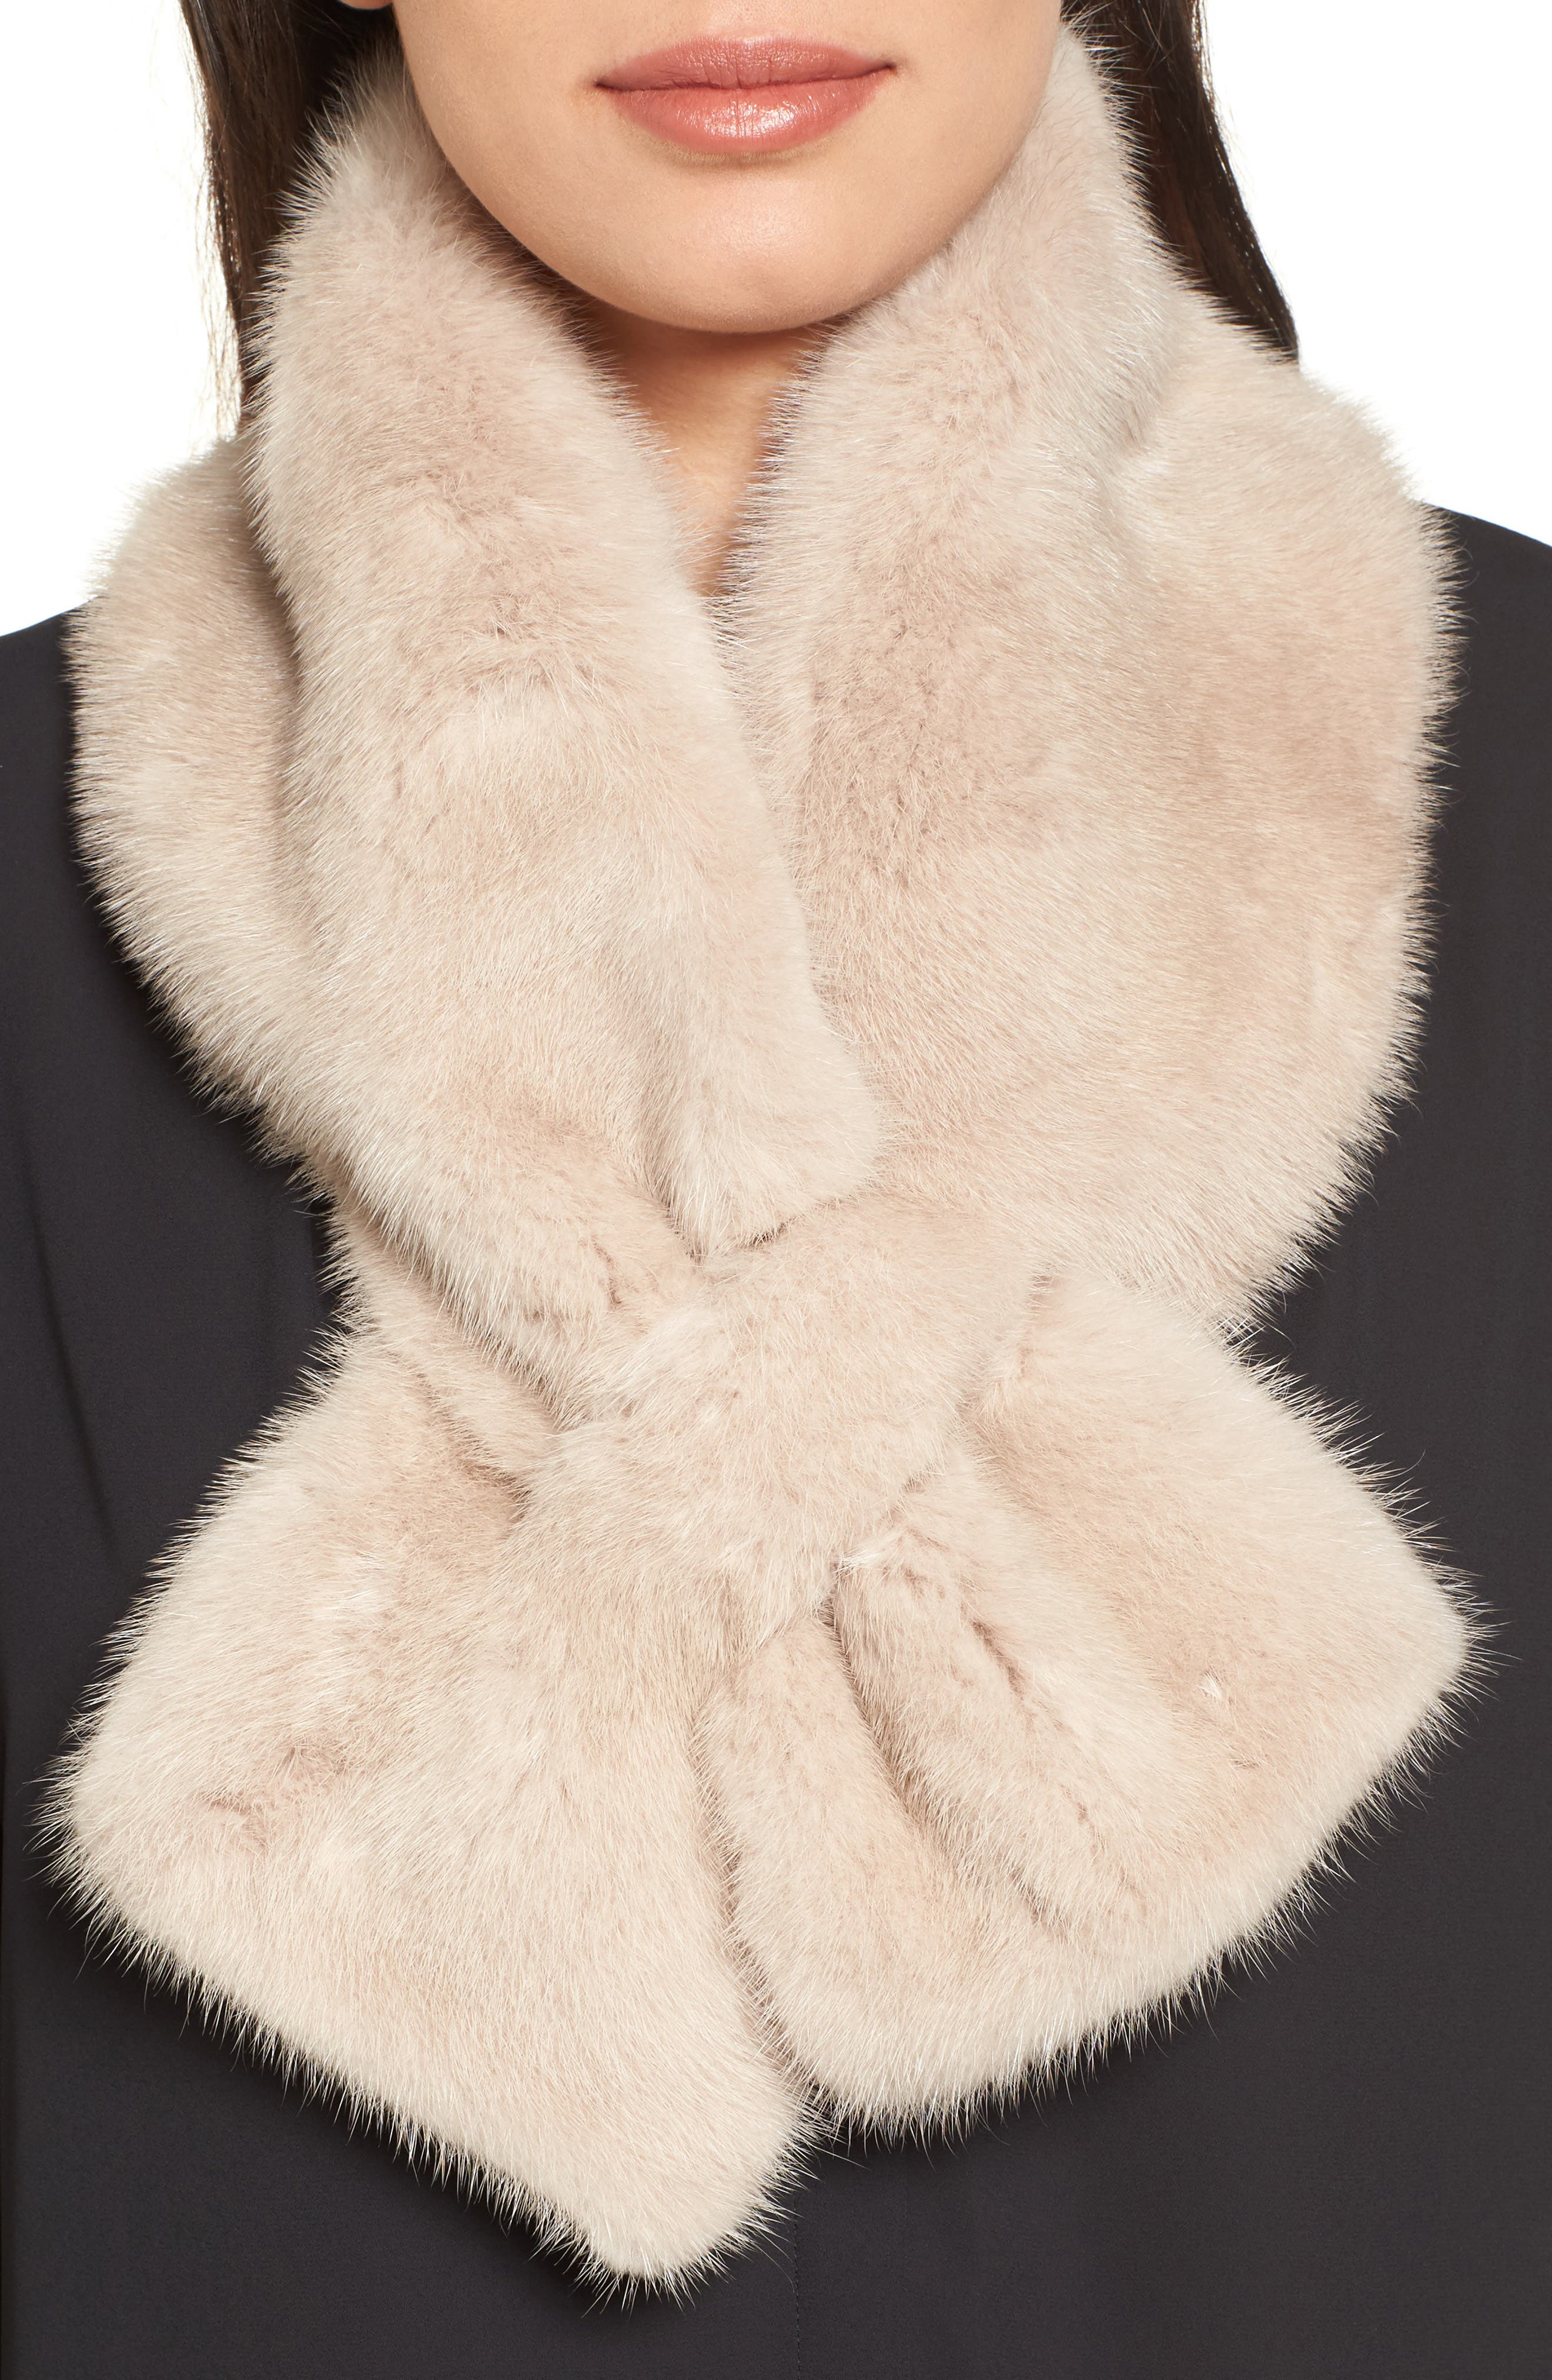 Main Image - Max Mara Genuine Mink Fur Collar